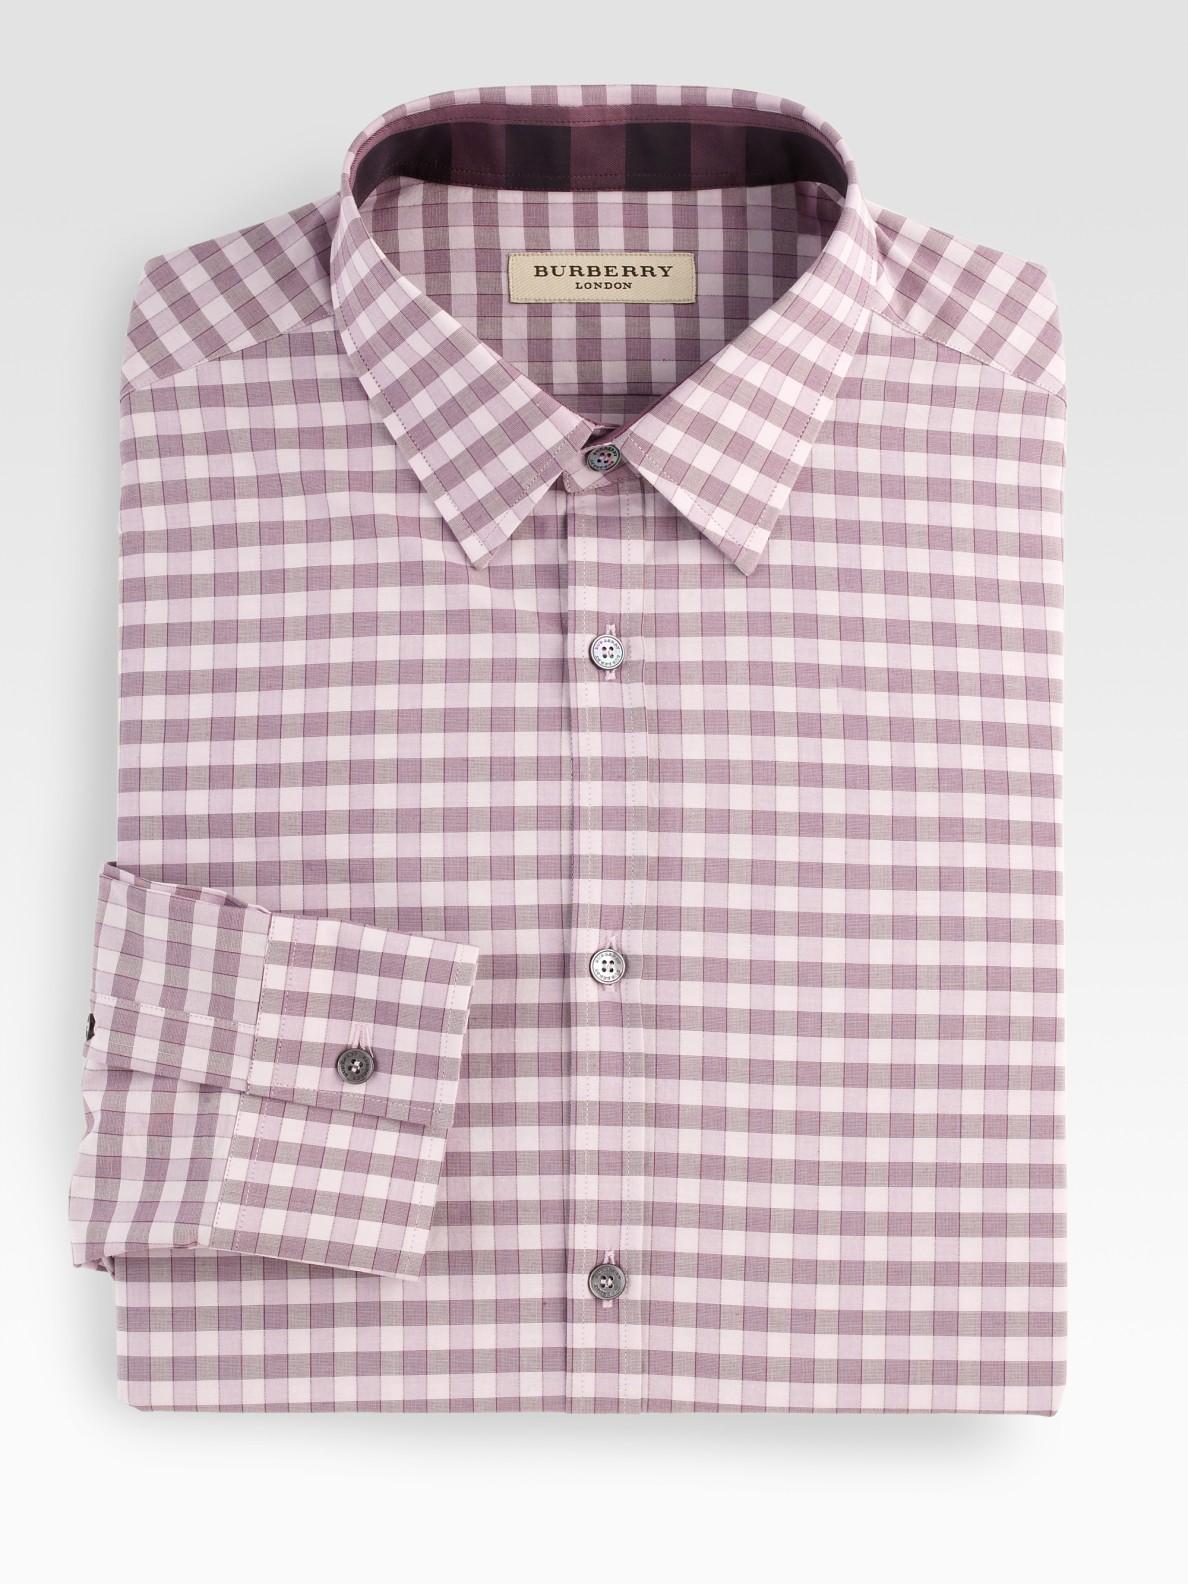 Burberry Gingham Check Dress Shirt In Purple For Men